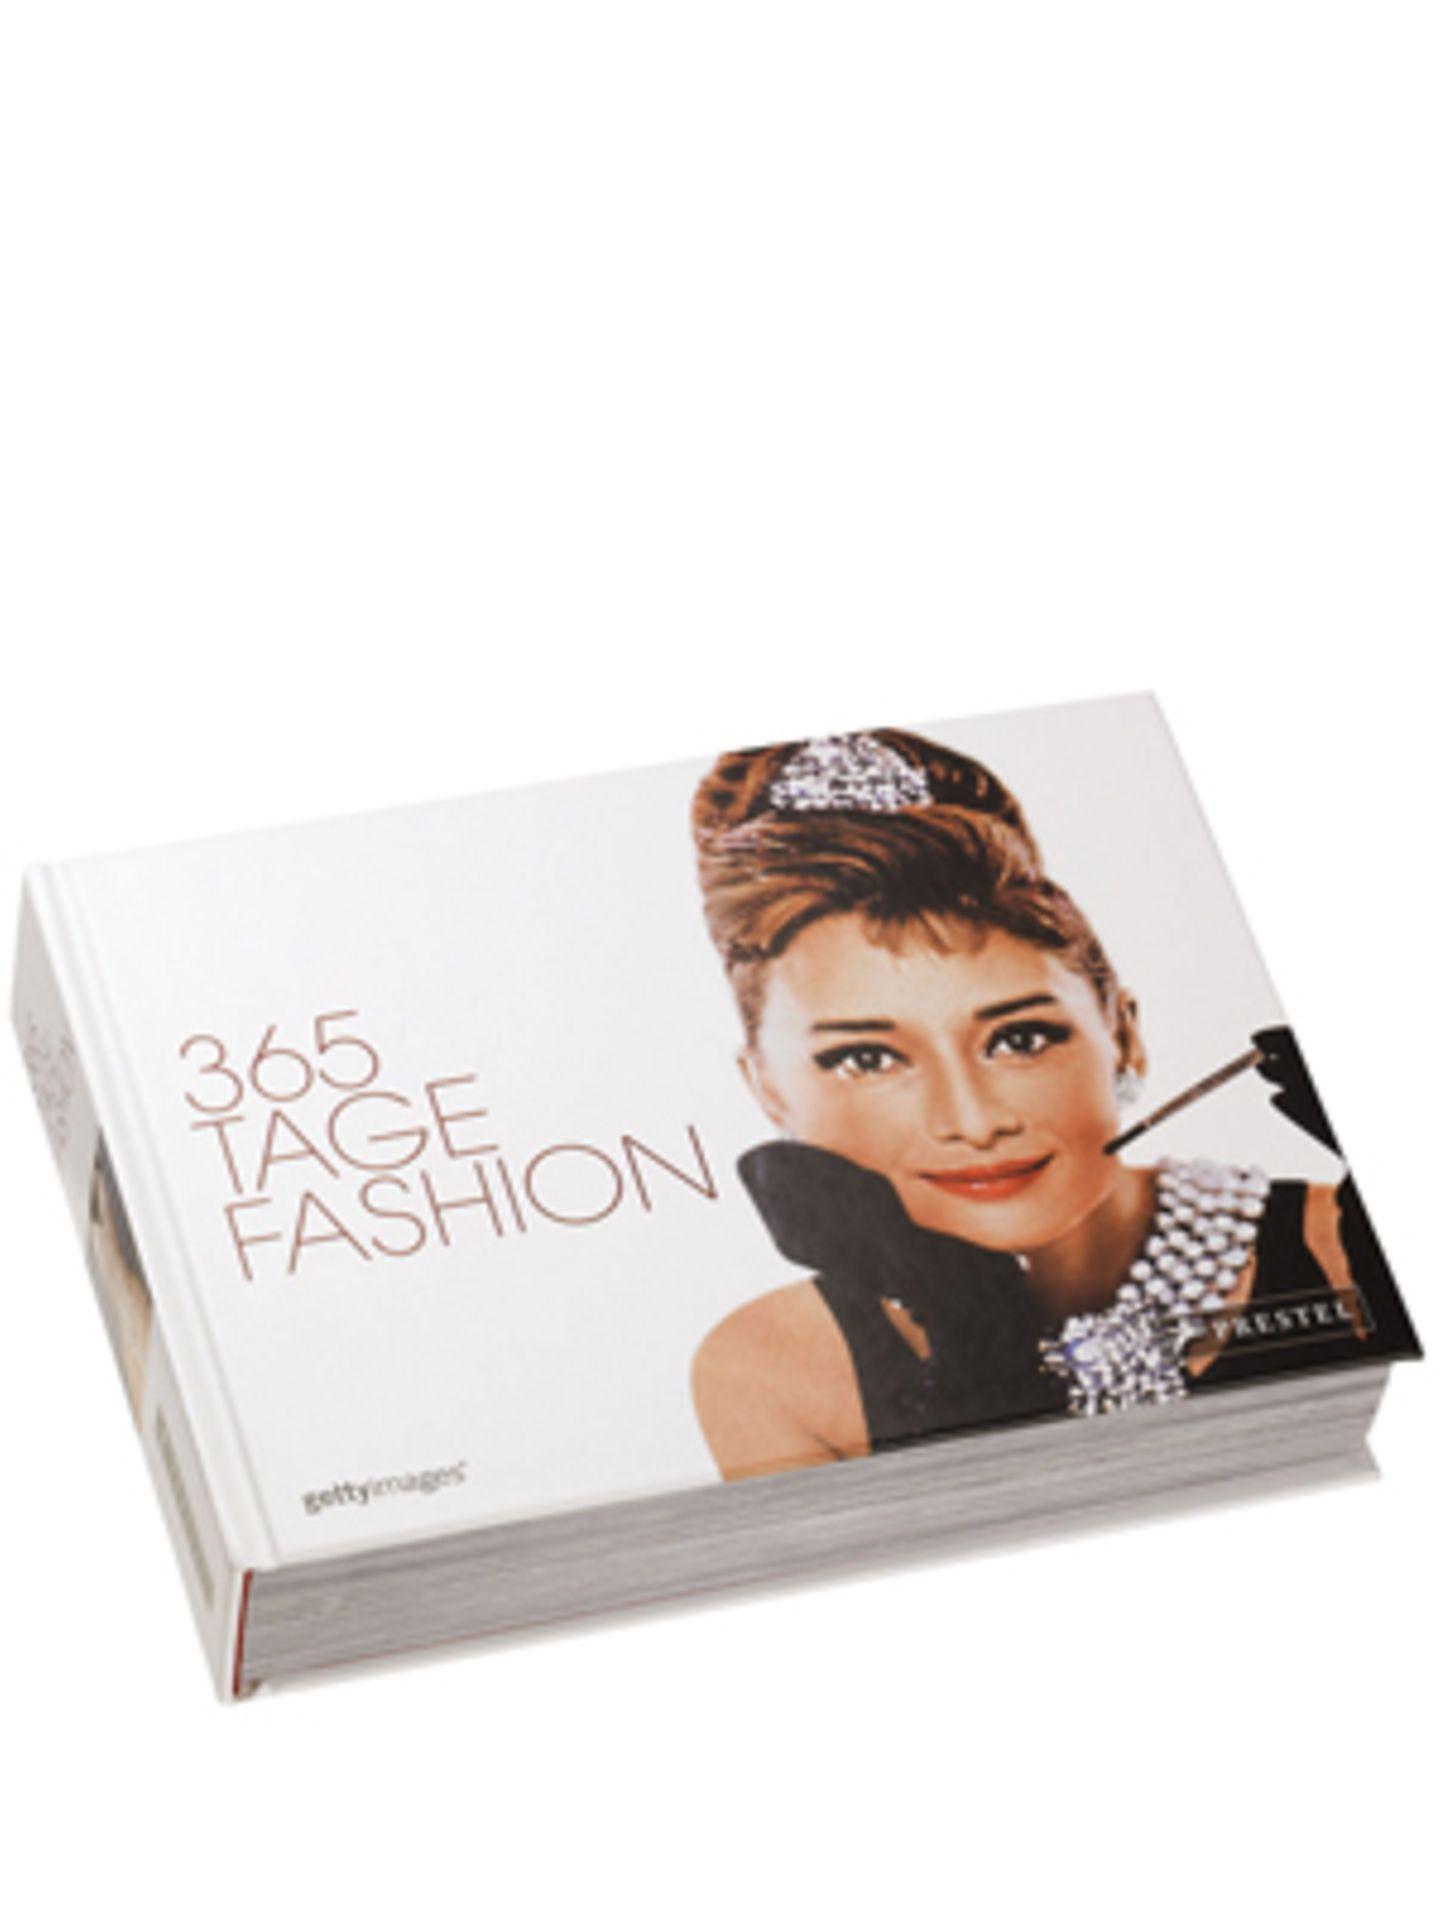 Modebewusstes Cousinchen? Dieser Kalender enthält ganze 365 Tage Mode. Über Conley's, um 30 Euro.